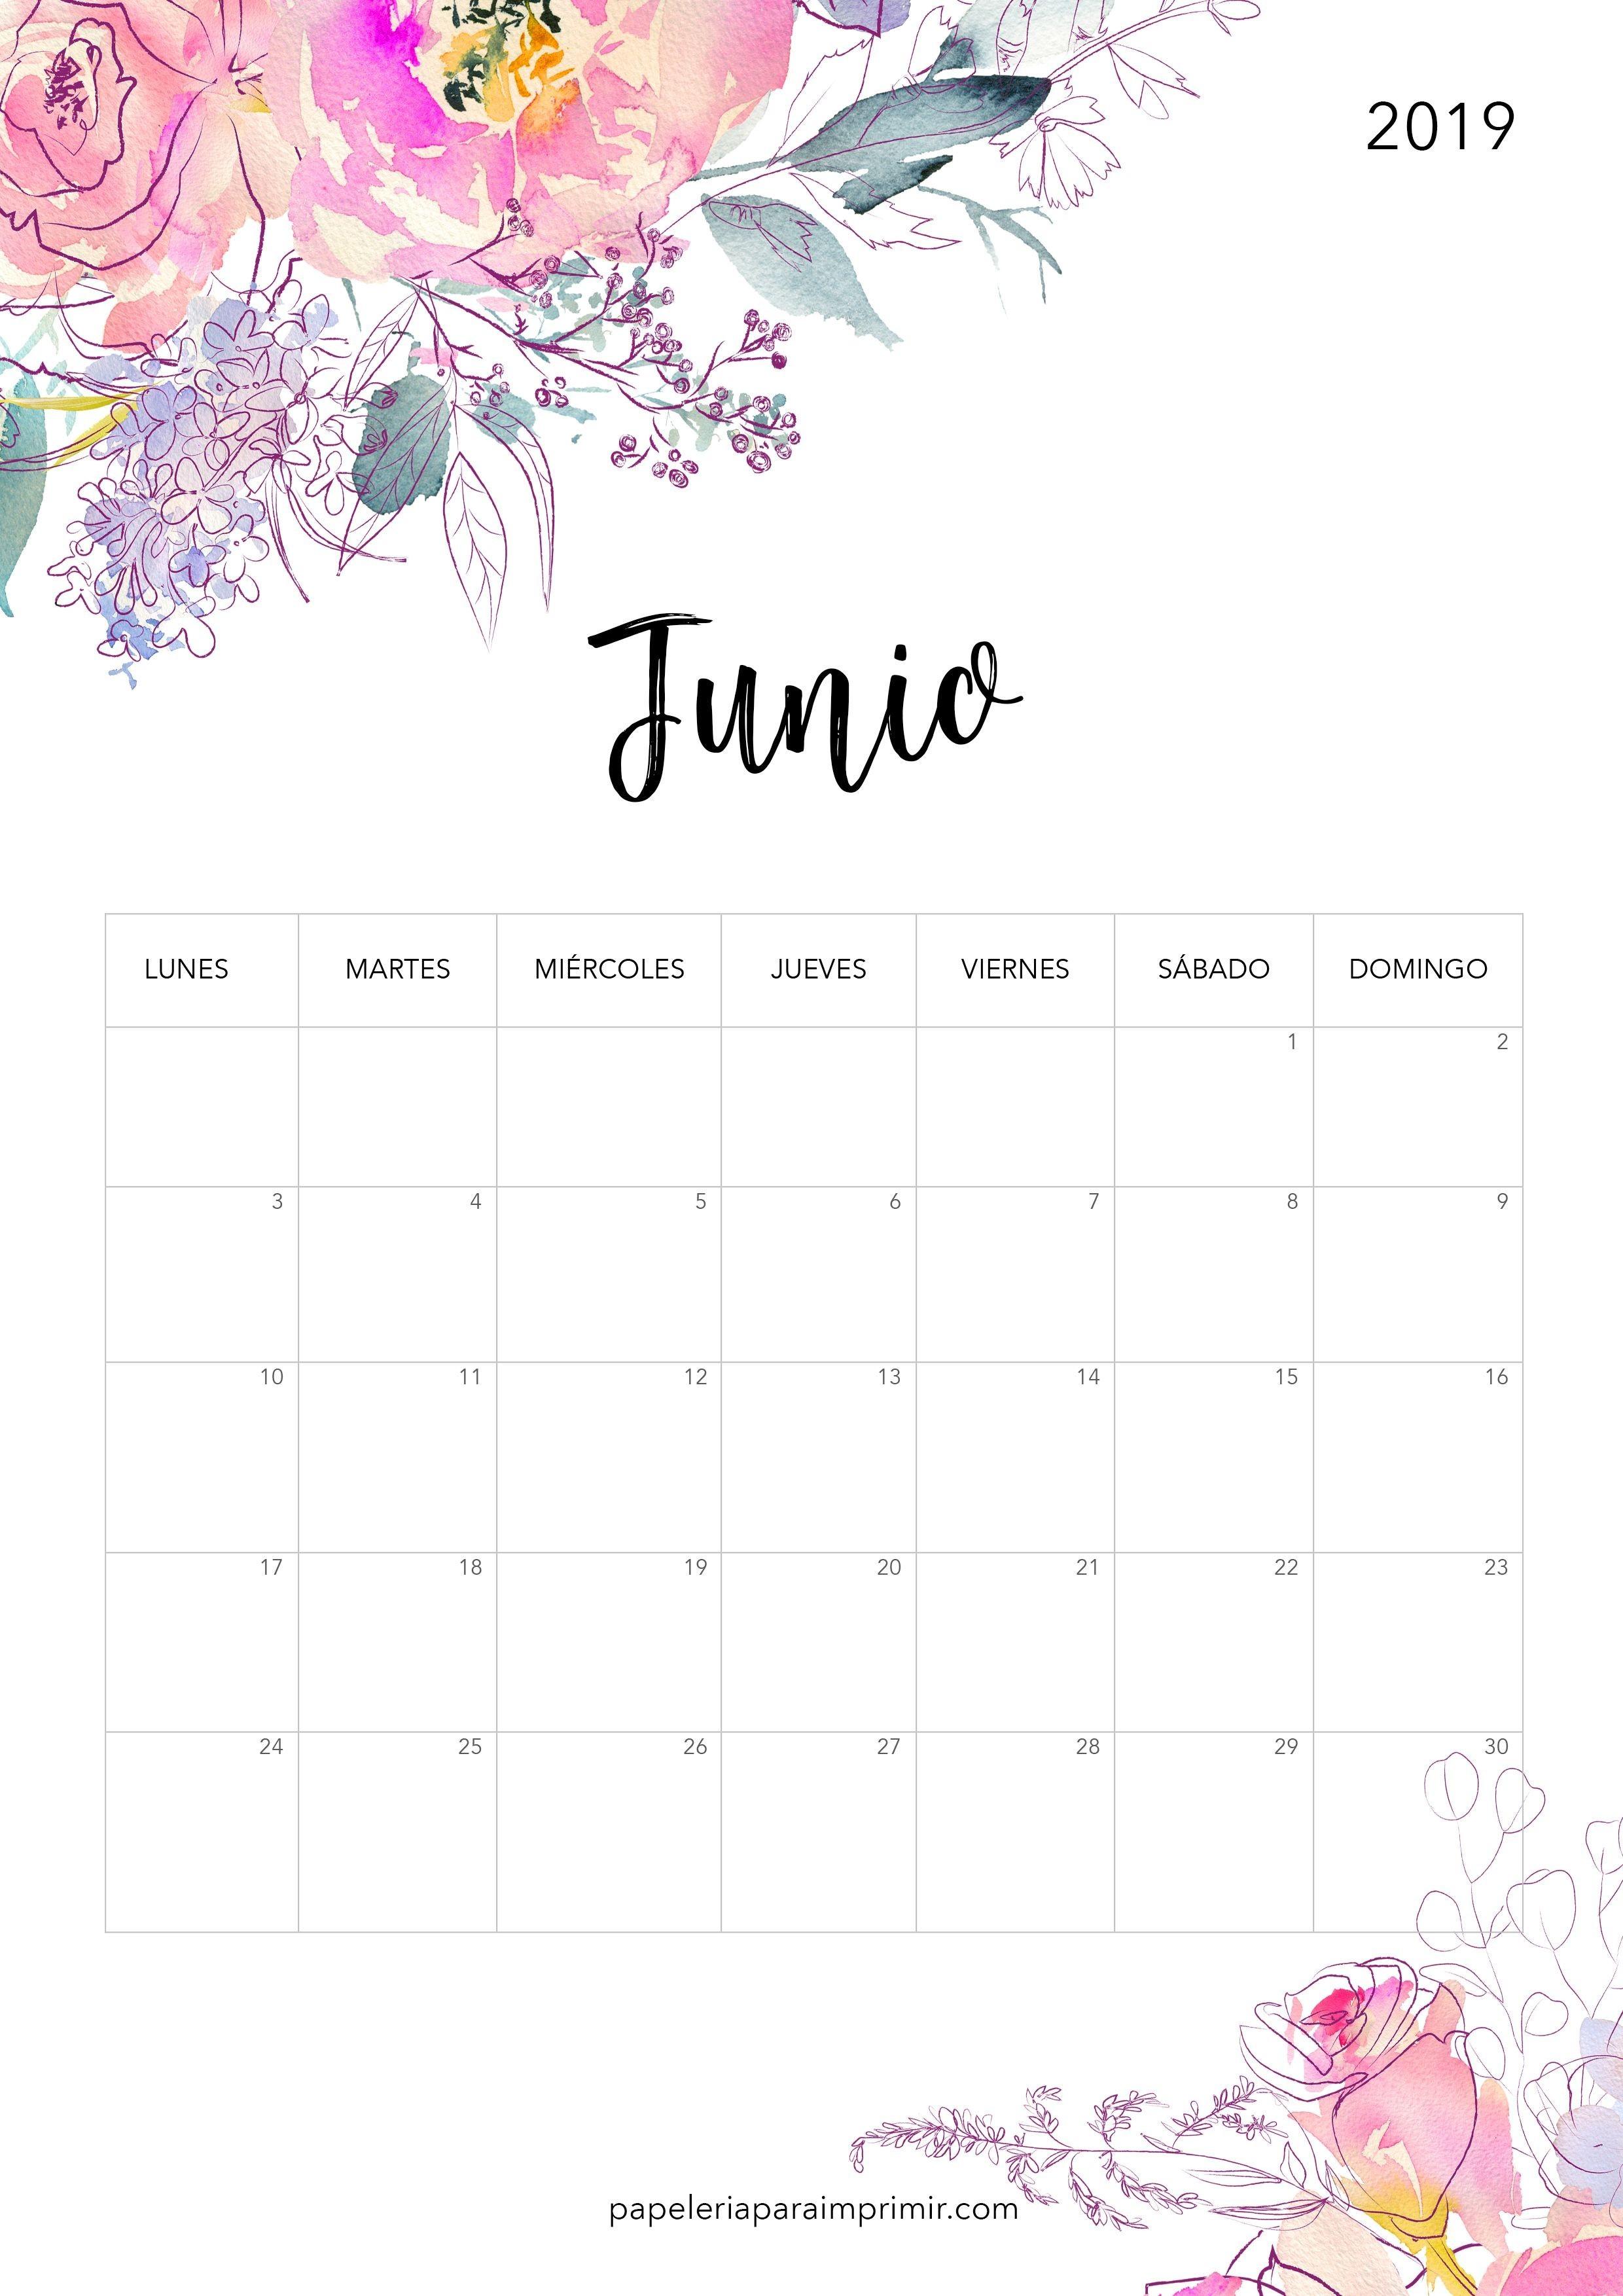 Imprimir Calendario Portugues 2019 Más Arriba-a-fecha Es Calendario Mes De Marzo 2019 Para Imprimir Of Imprimir Calendario Portugues 2019 Mejores Y Más Novedosos Pin De Calendario Hispano En Calendario Con Feriados A±o 2019